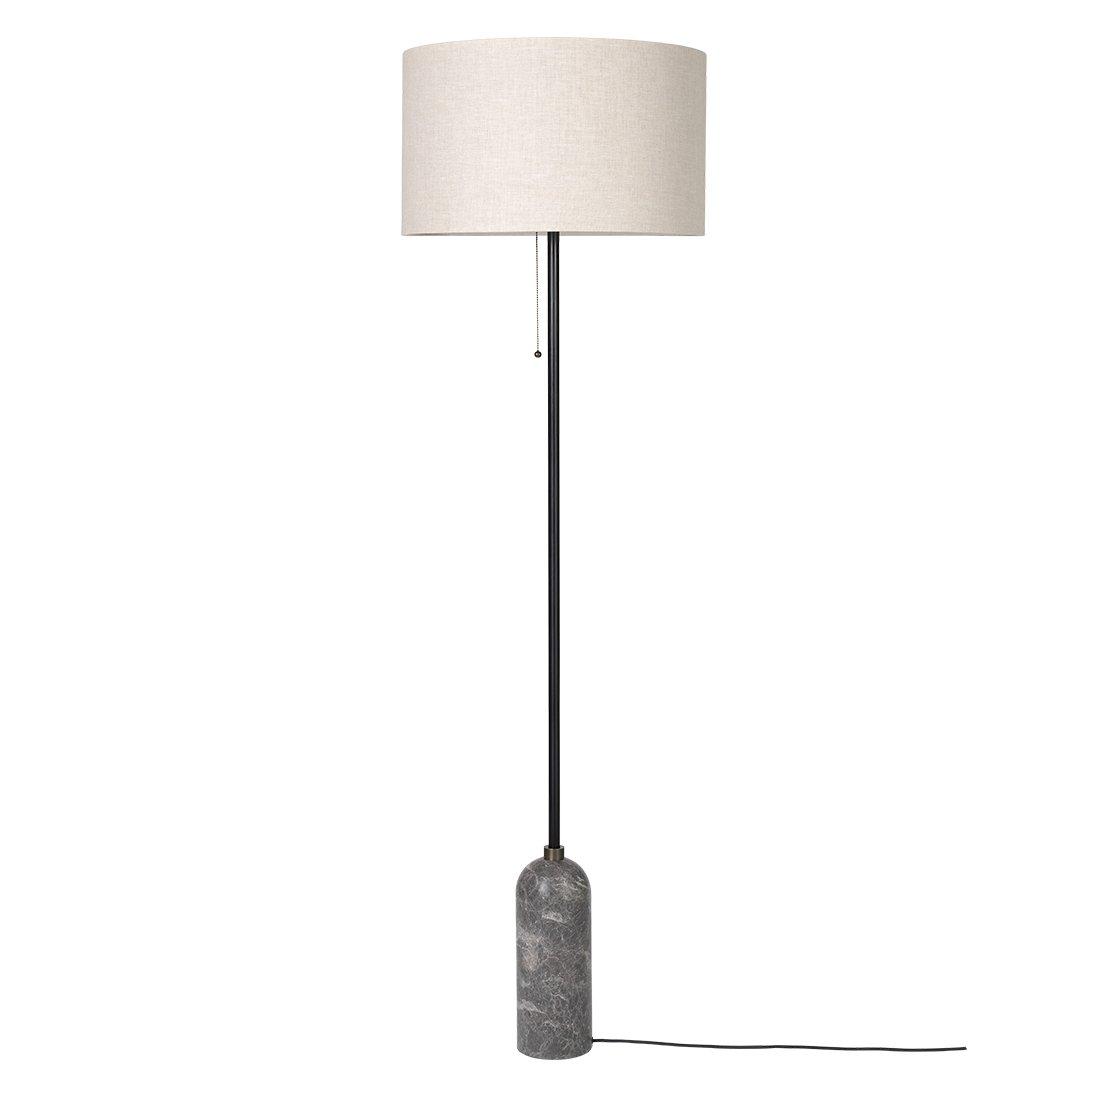 Gubi Gravity Vloerlamp Grijs Marmer - Canvas Kap